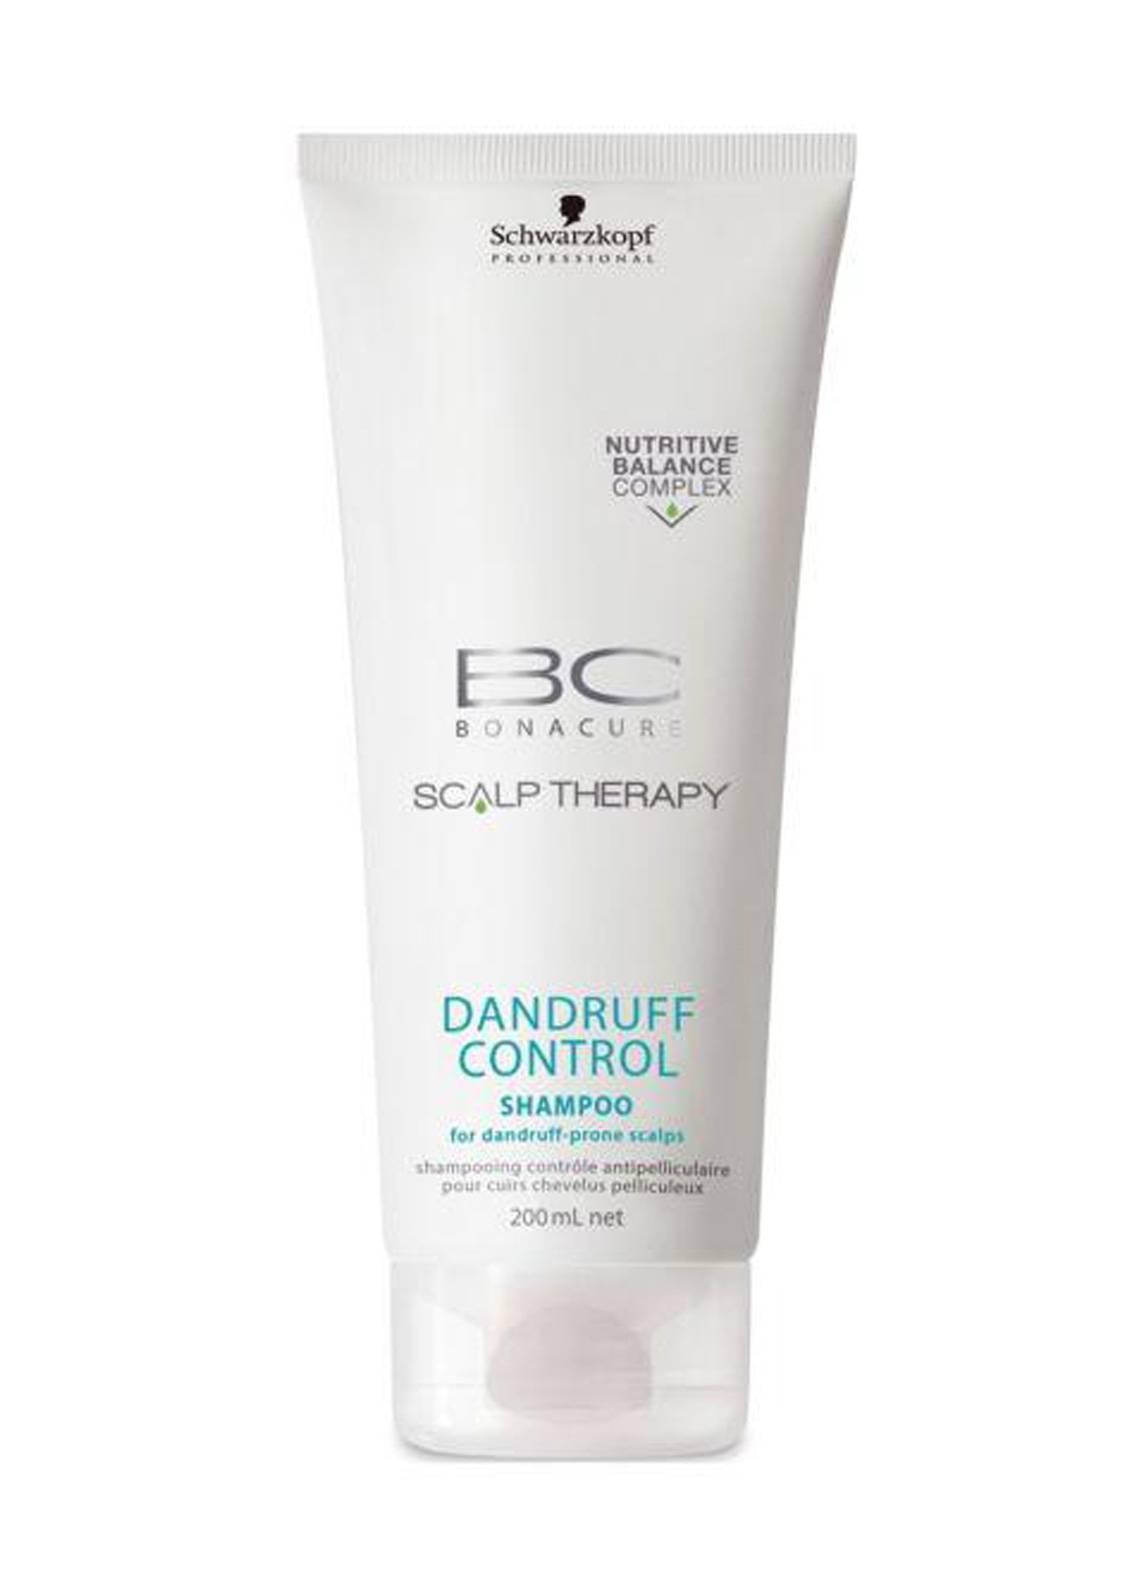 Schwarzkopf Bonacure Scalp Genesis Anti Dandruff Shampoo - 200ml